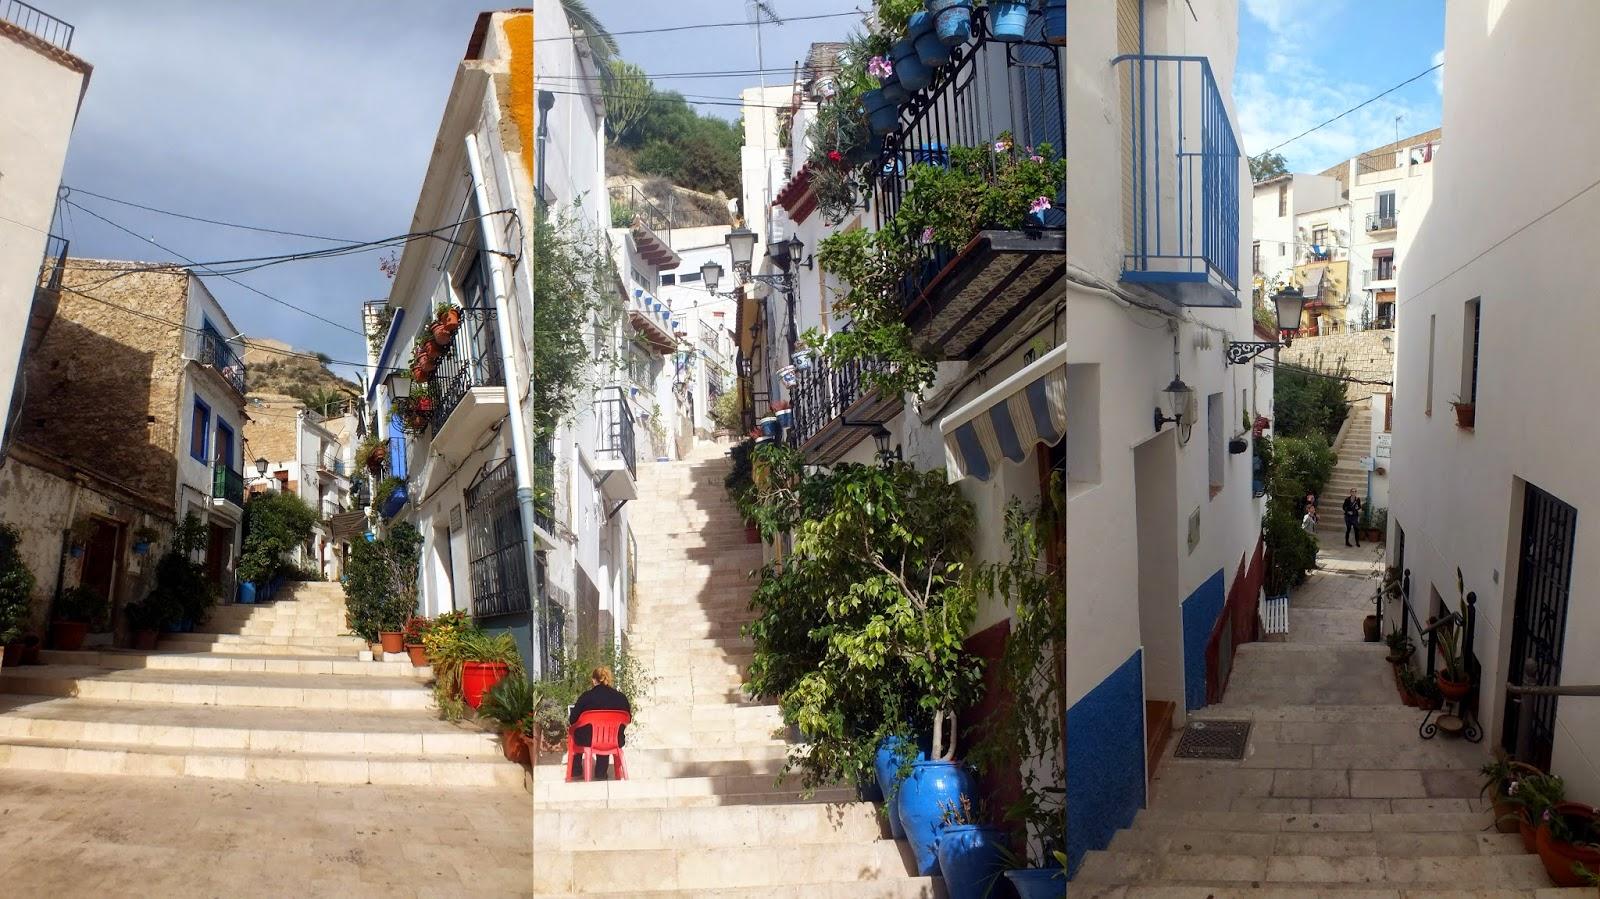 calles de Alicante turísticas